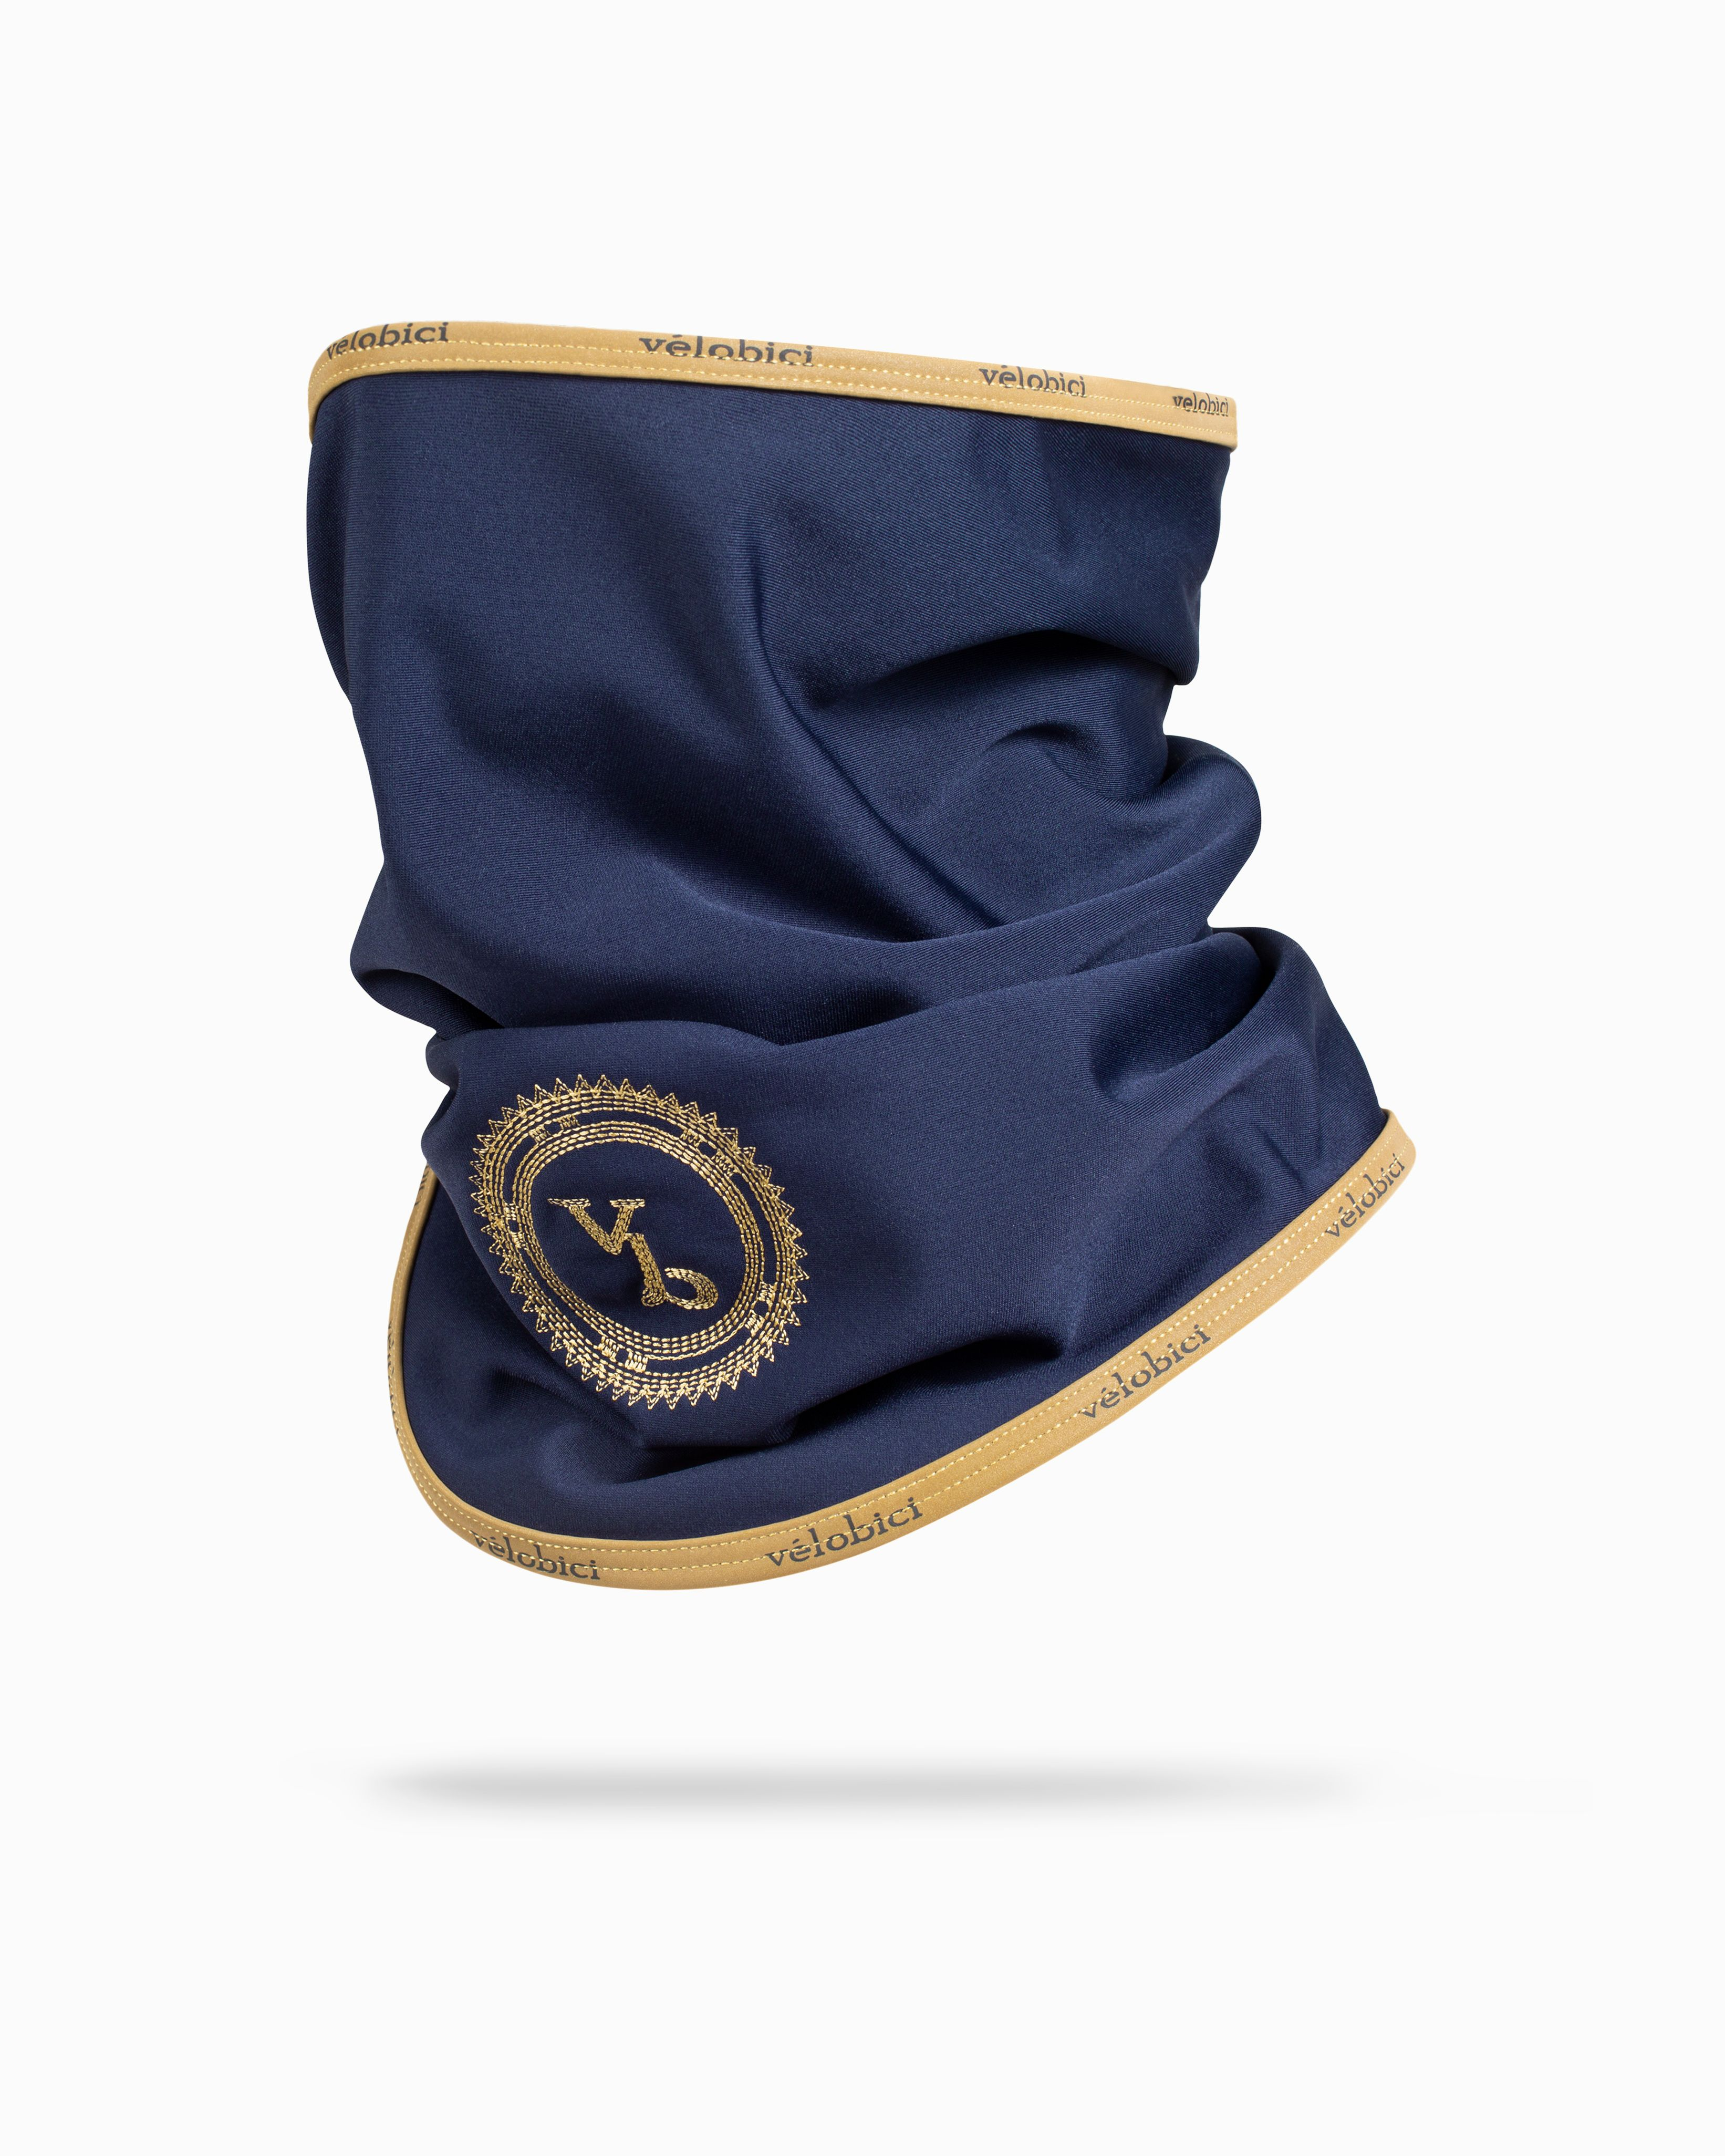 VB Thermal Collar (Navy)